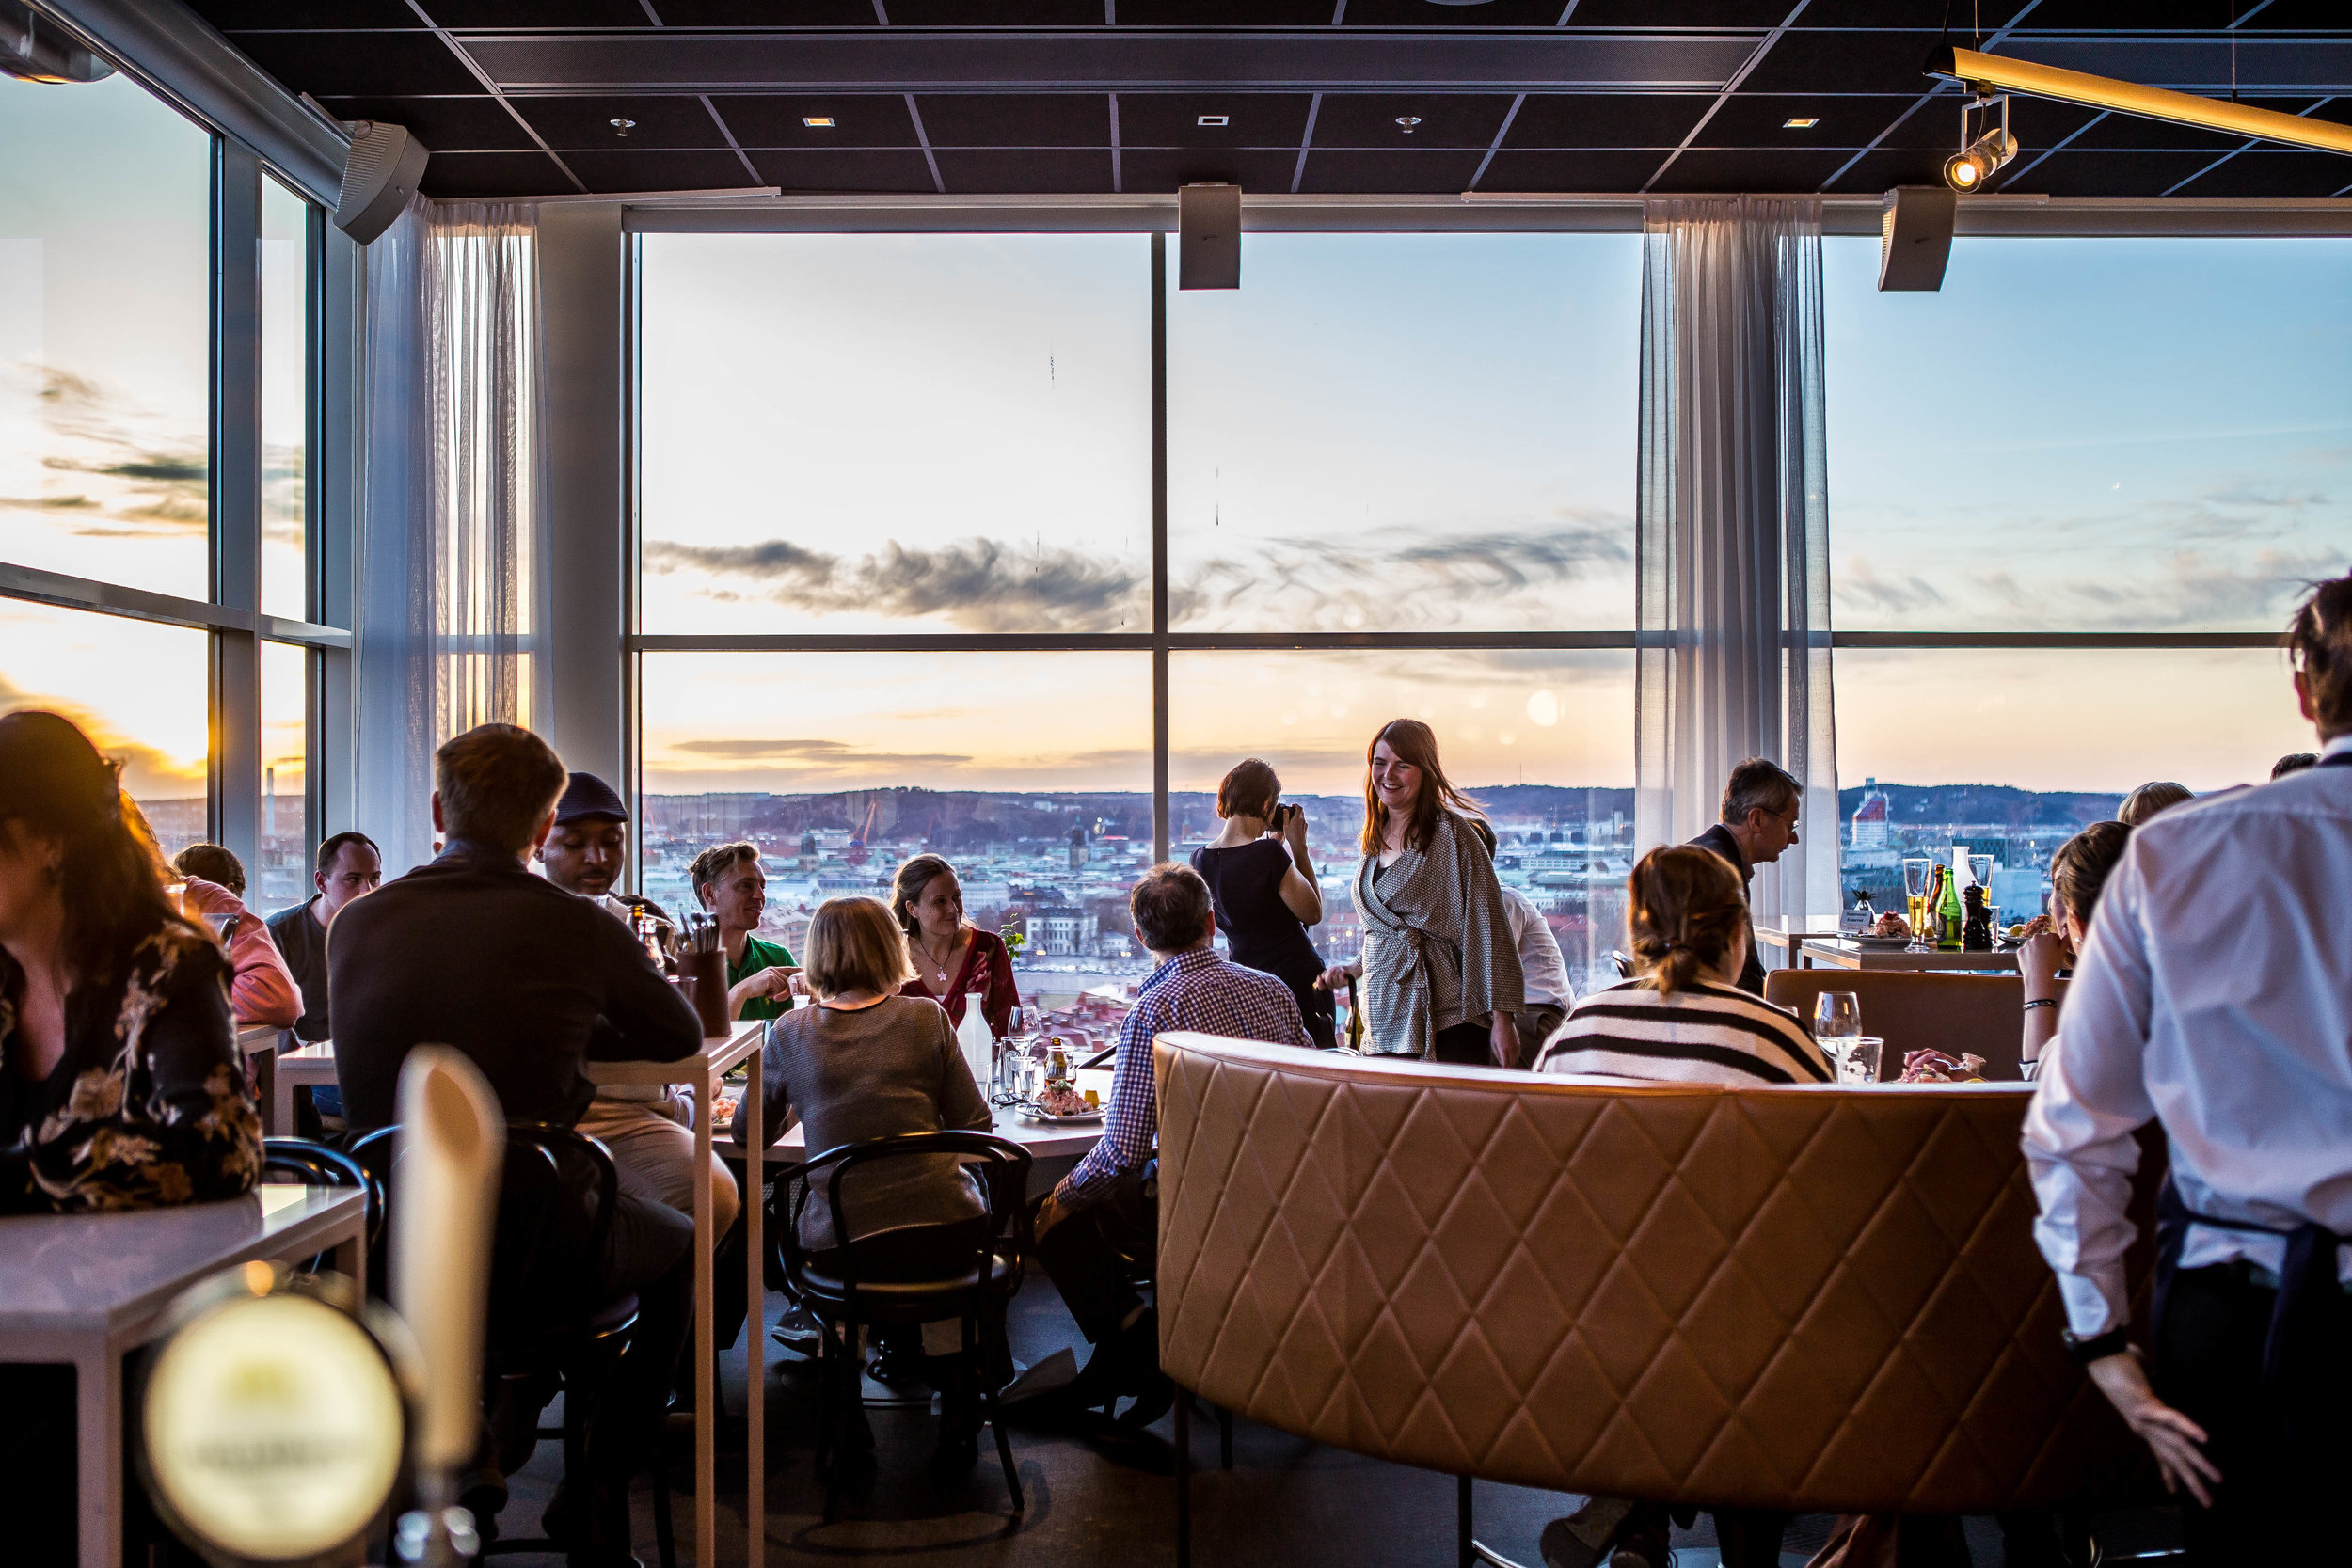 Sofa-restaurant-Heaven23-Gothenburg-Sweden-Facctory-photographer-Julio-Chang-2.jpg